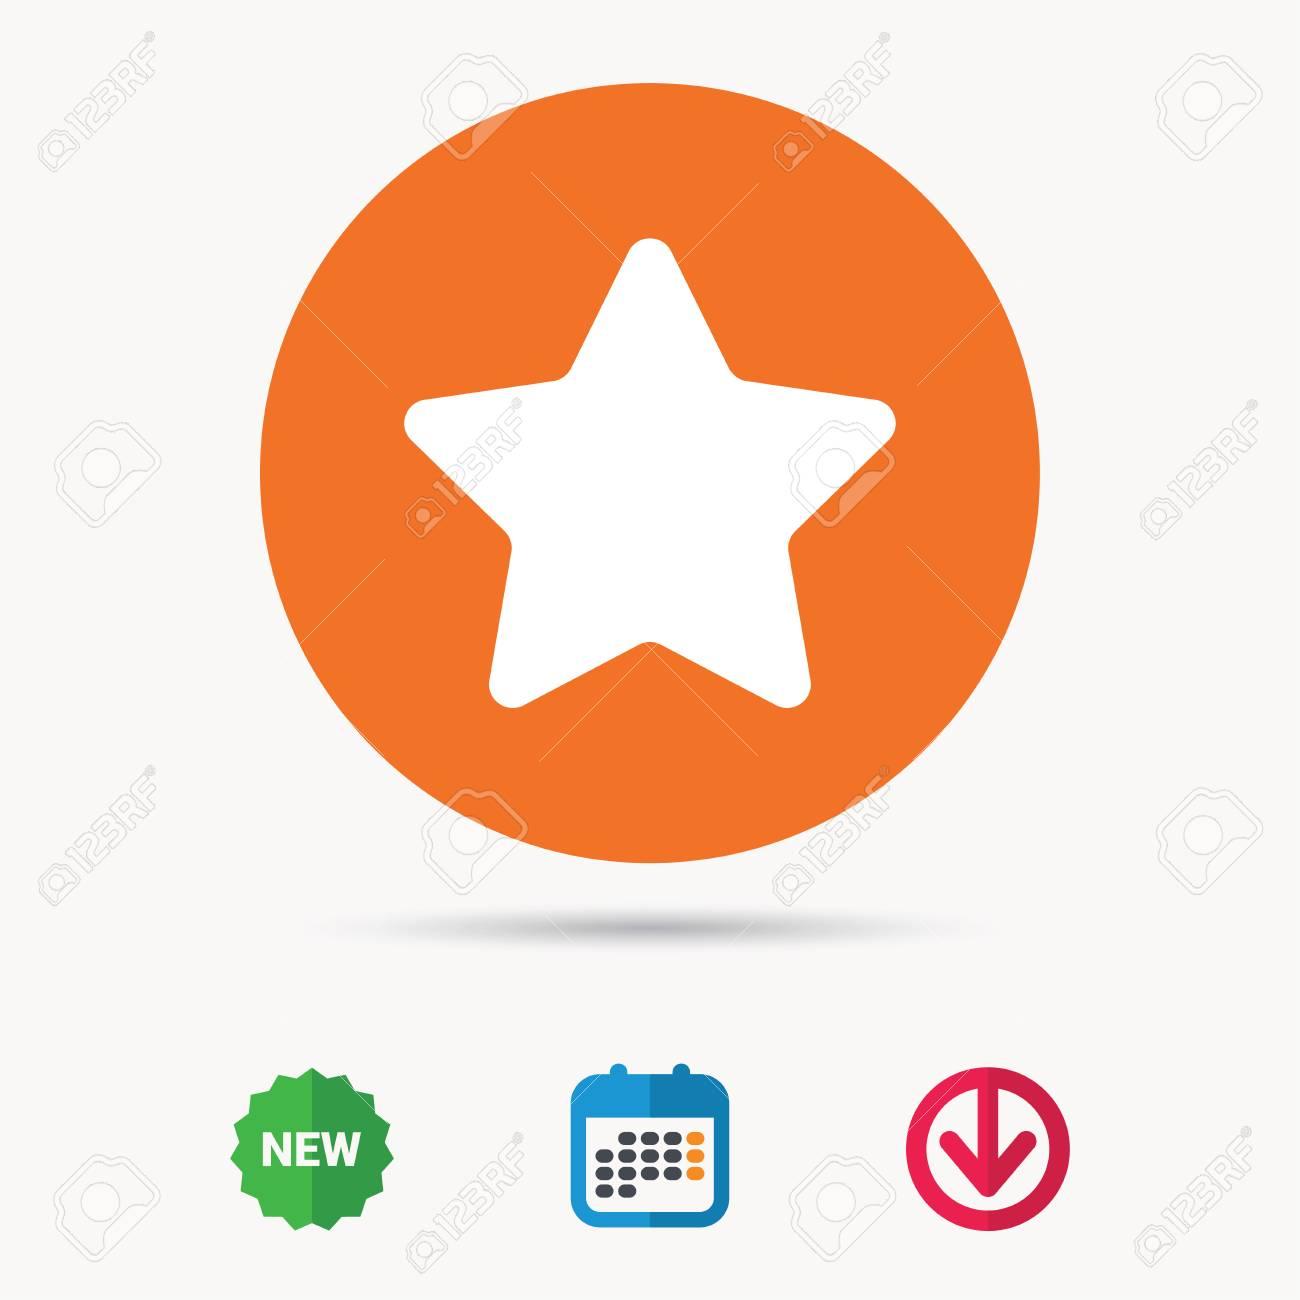 Star icon. Favorite or best sign. Web ranking symbol. Calendar.